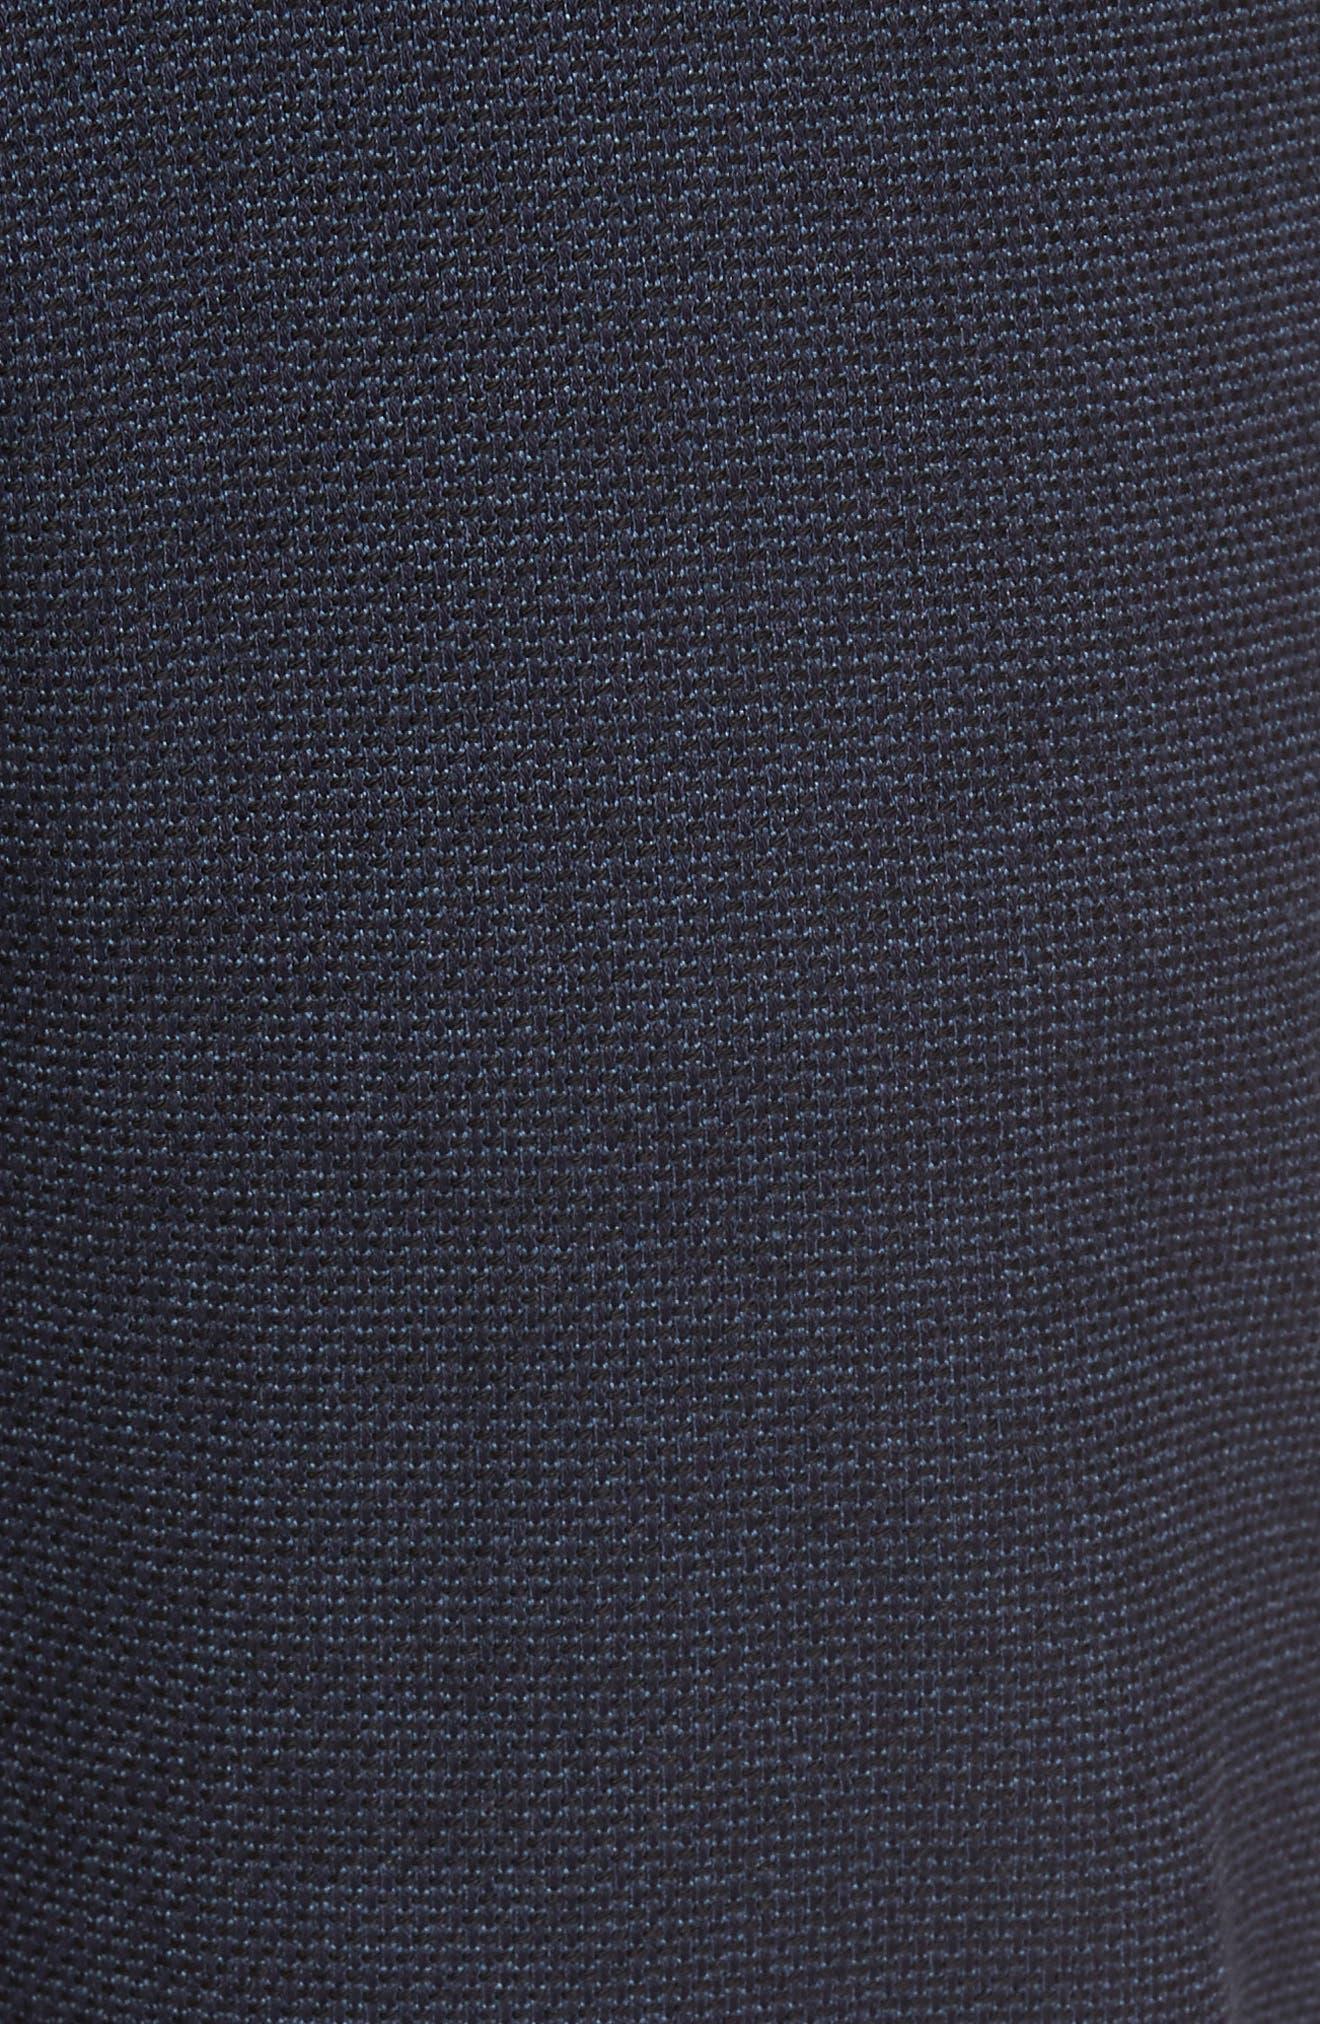 Vince Slim Fit Stretch Five-Pocket Pants,                             Alternate thumbnail 6, color,                             Navy Digital Neat